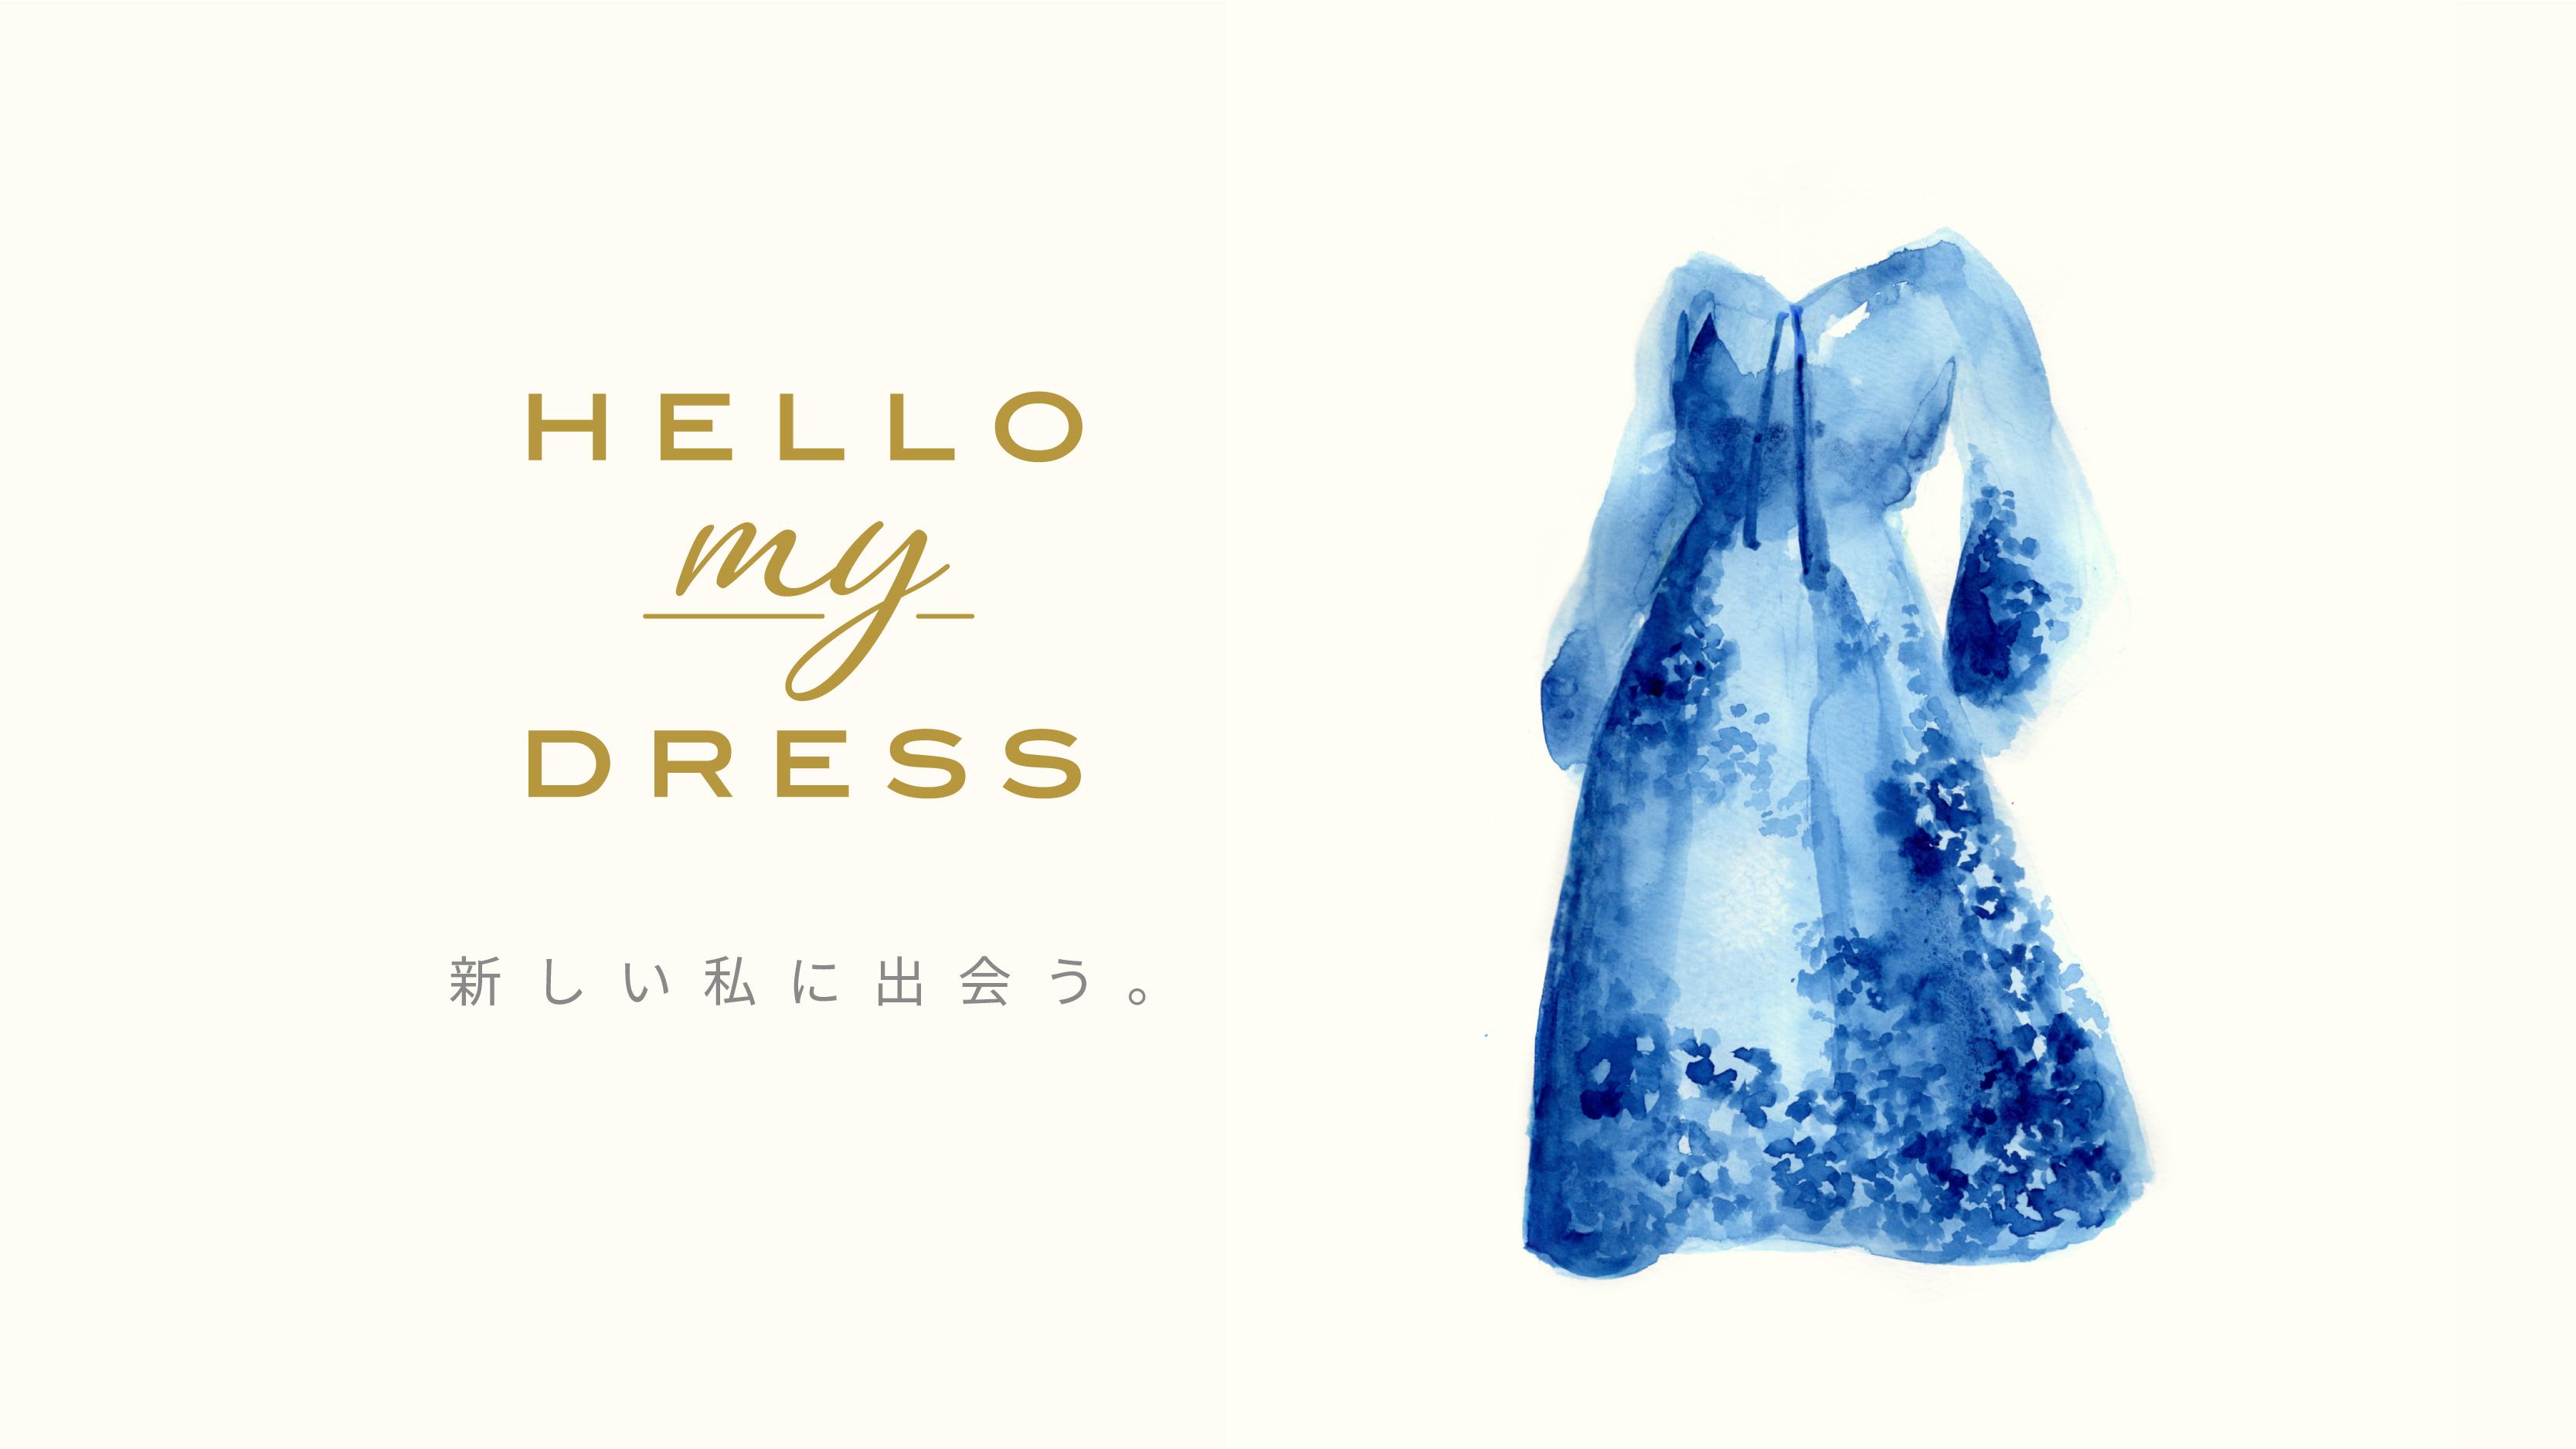 HELLO my DRESS 新しい私に出会う。